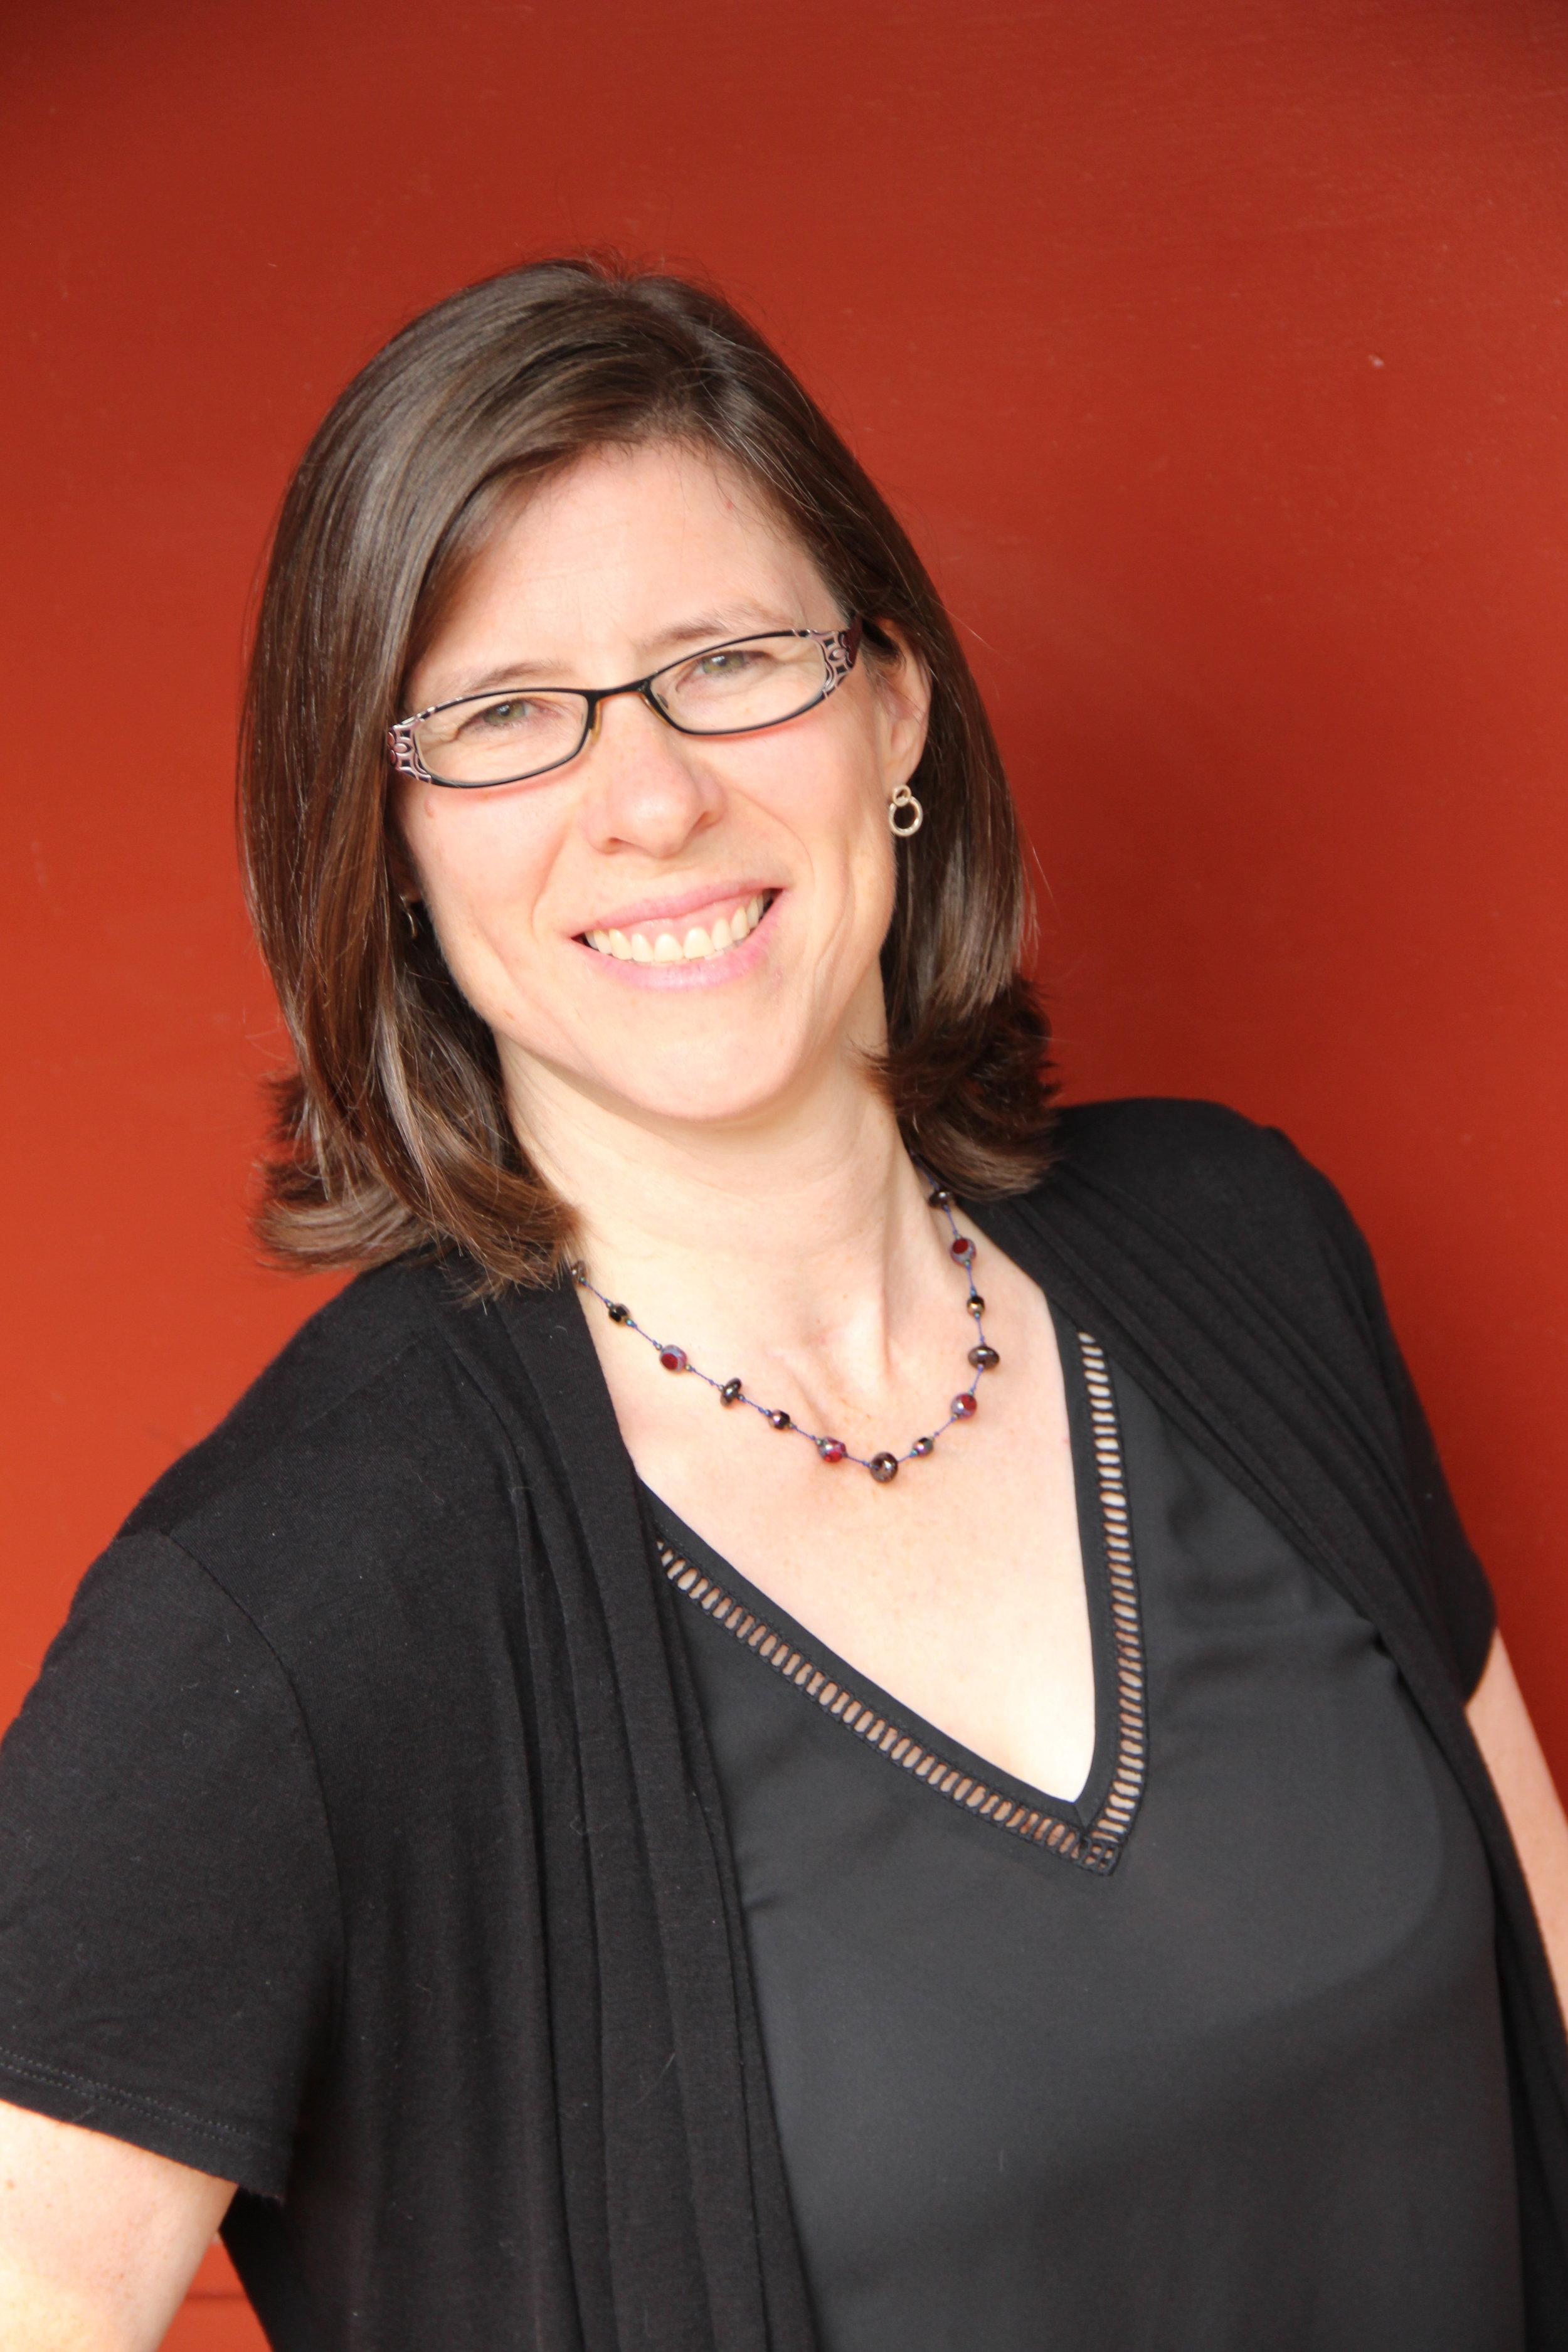 Dr. Stefanie-desautel-chiropractic